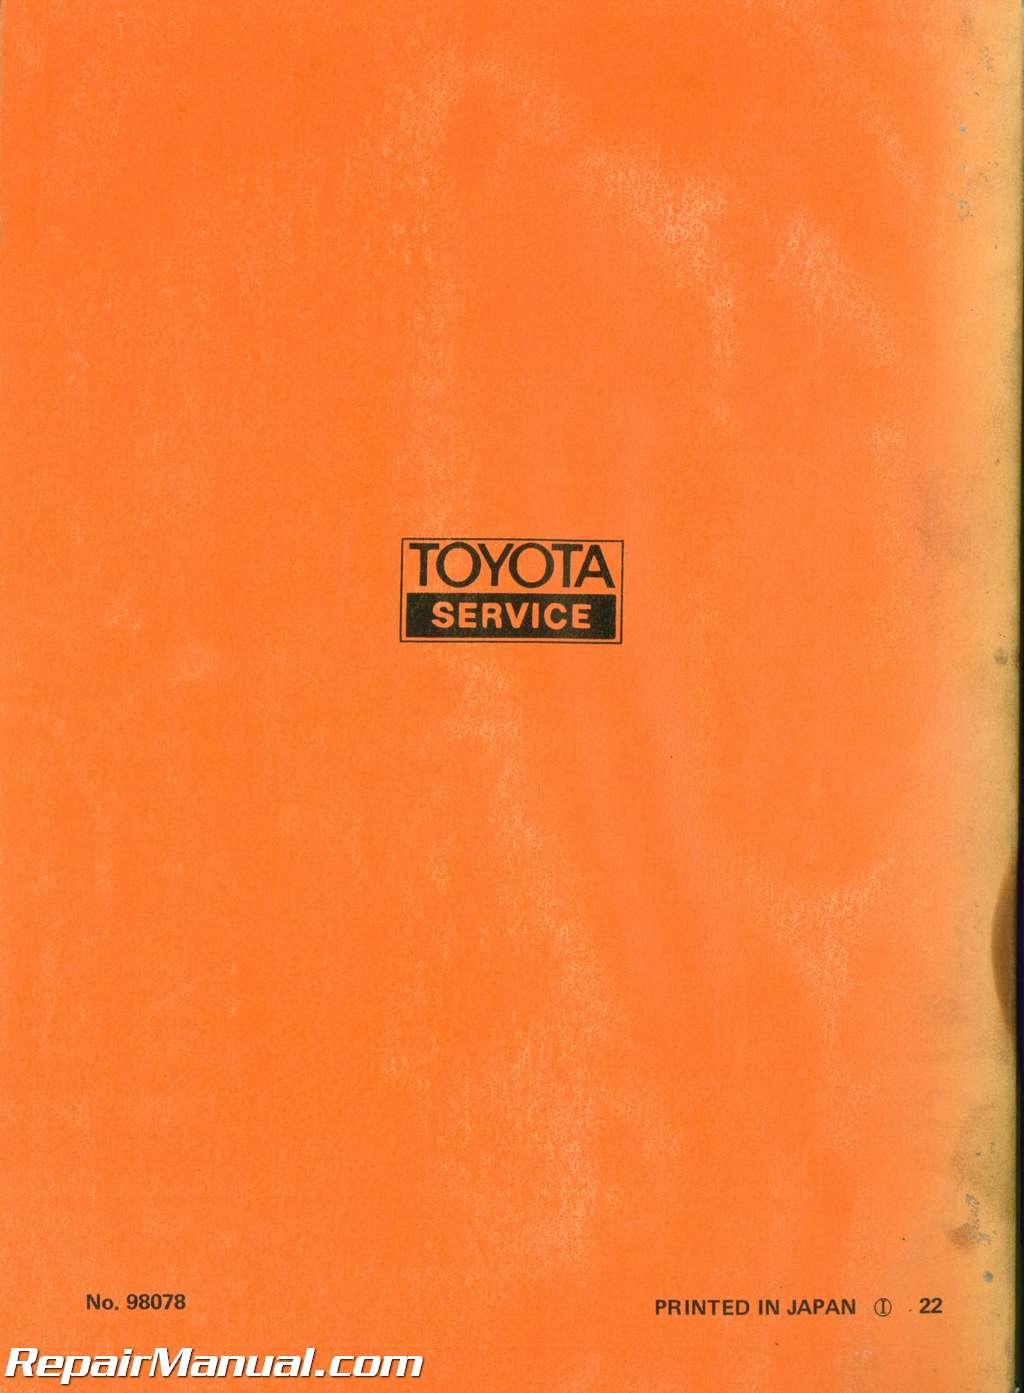 Used 1972 Toyota Corona Mark Ii Chassis Group Repair Manual